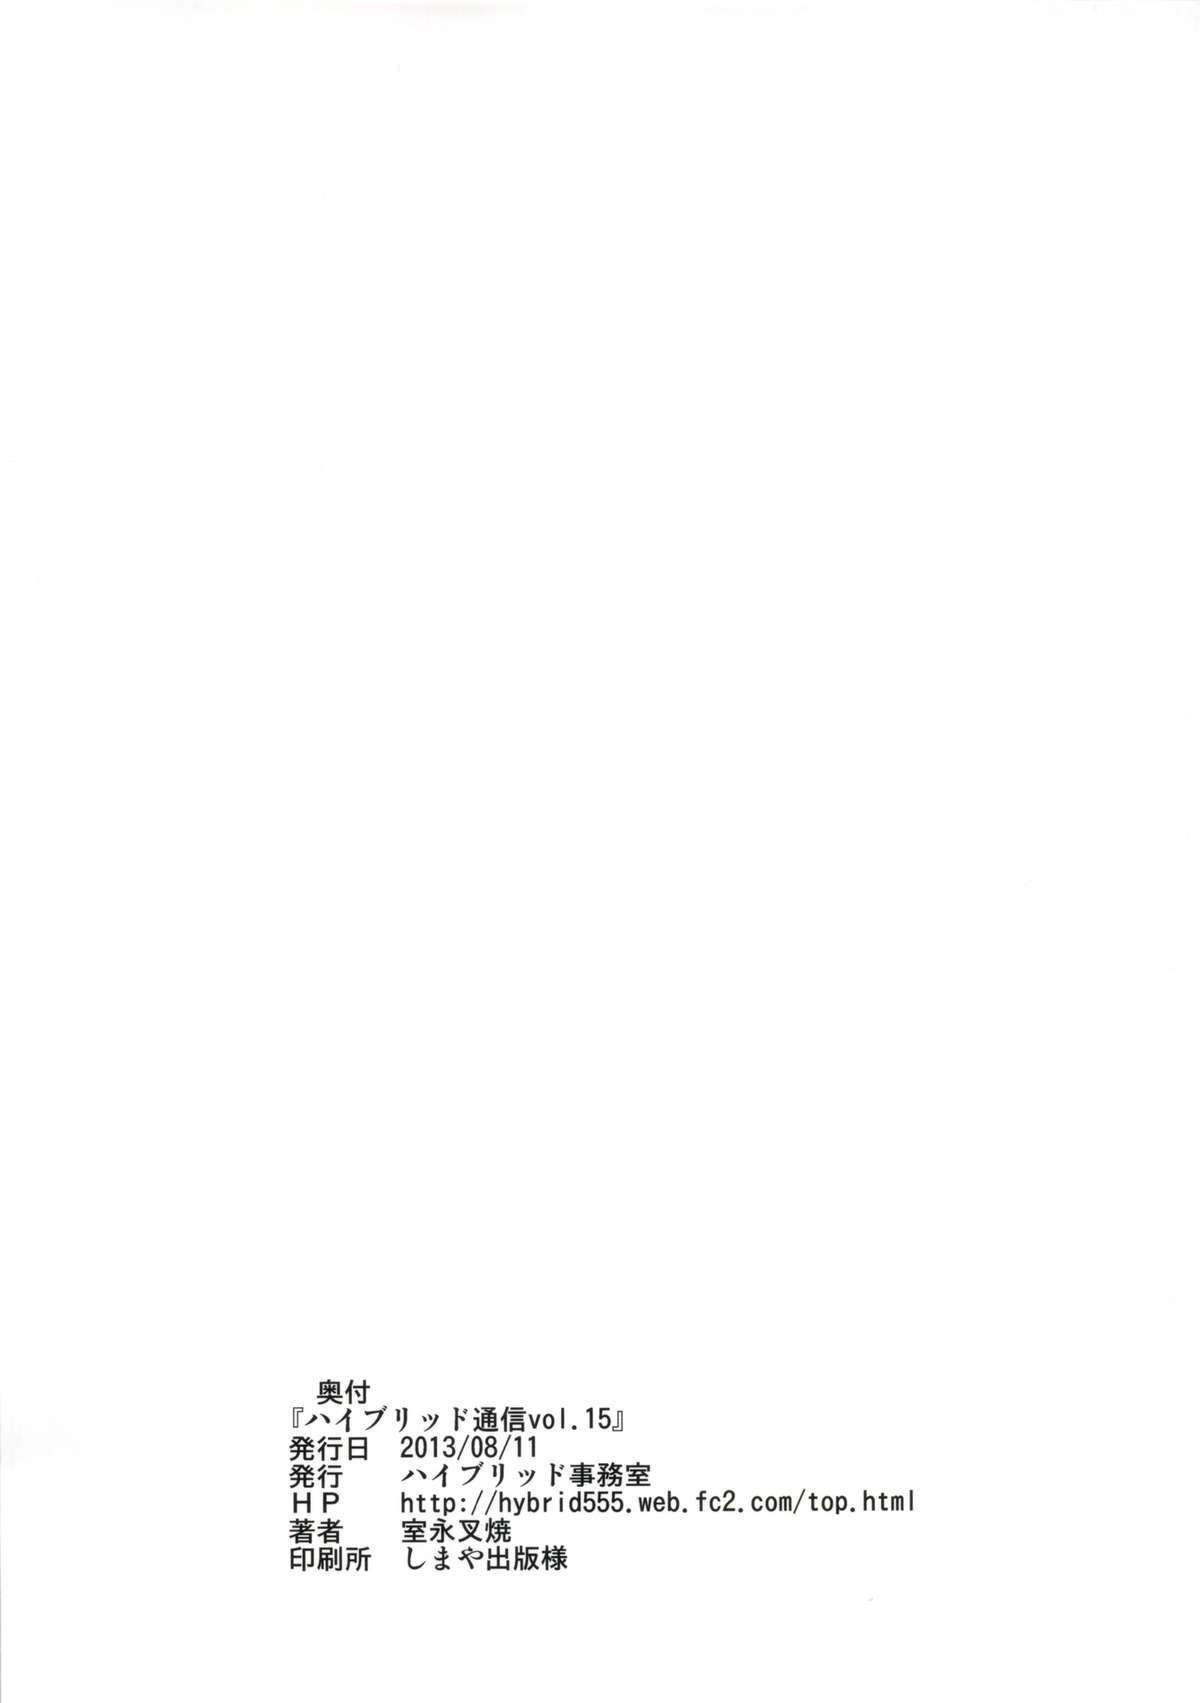 Hybrid Tsuushin vol.15 13